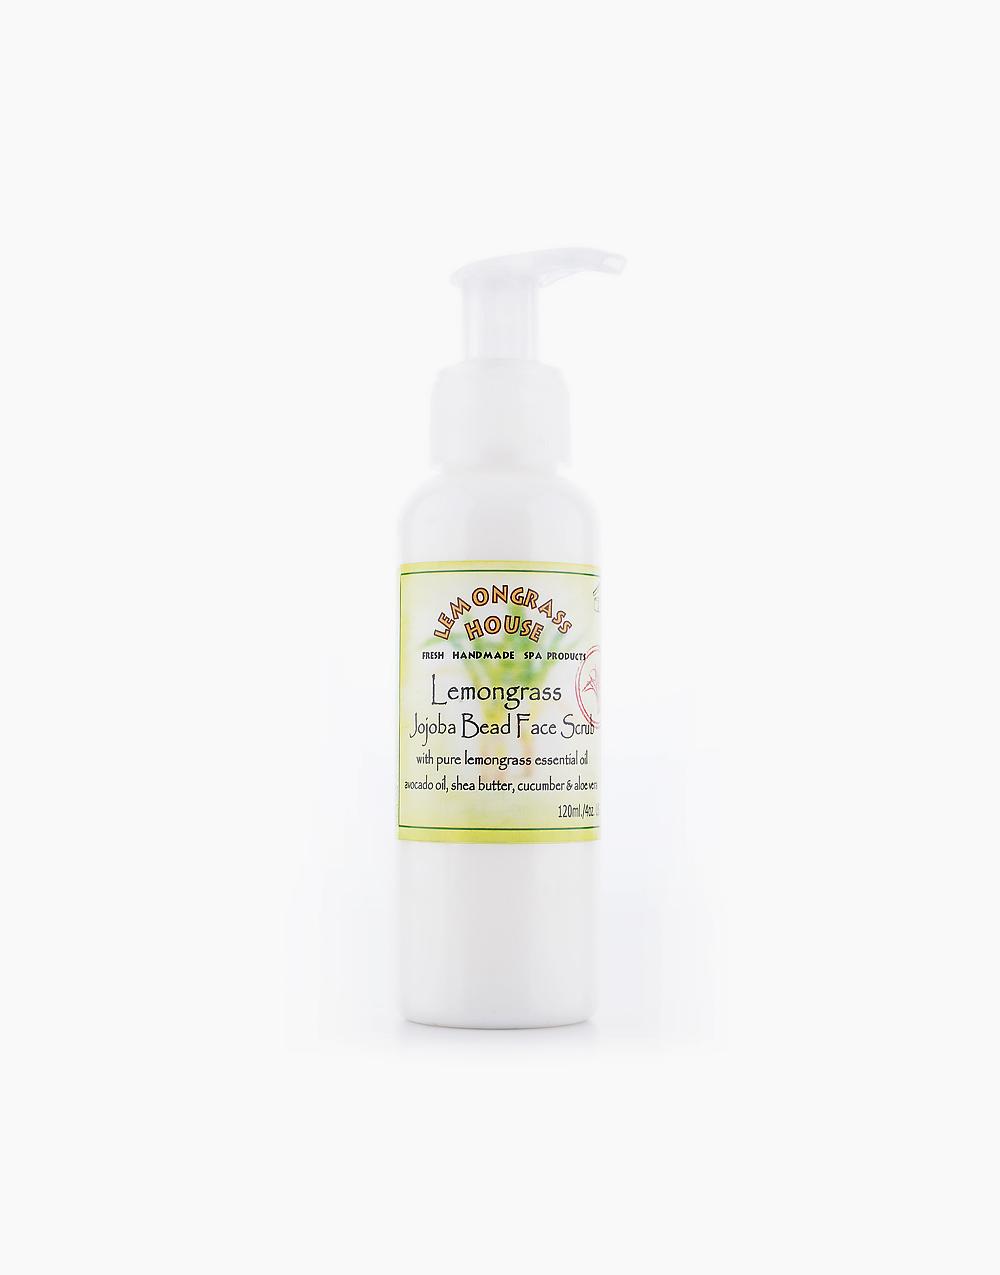 Lemongrass Face Scrub (120ml) by Lemongrass House